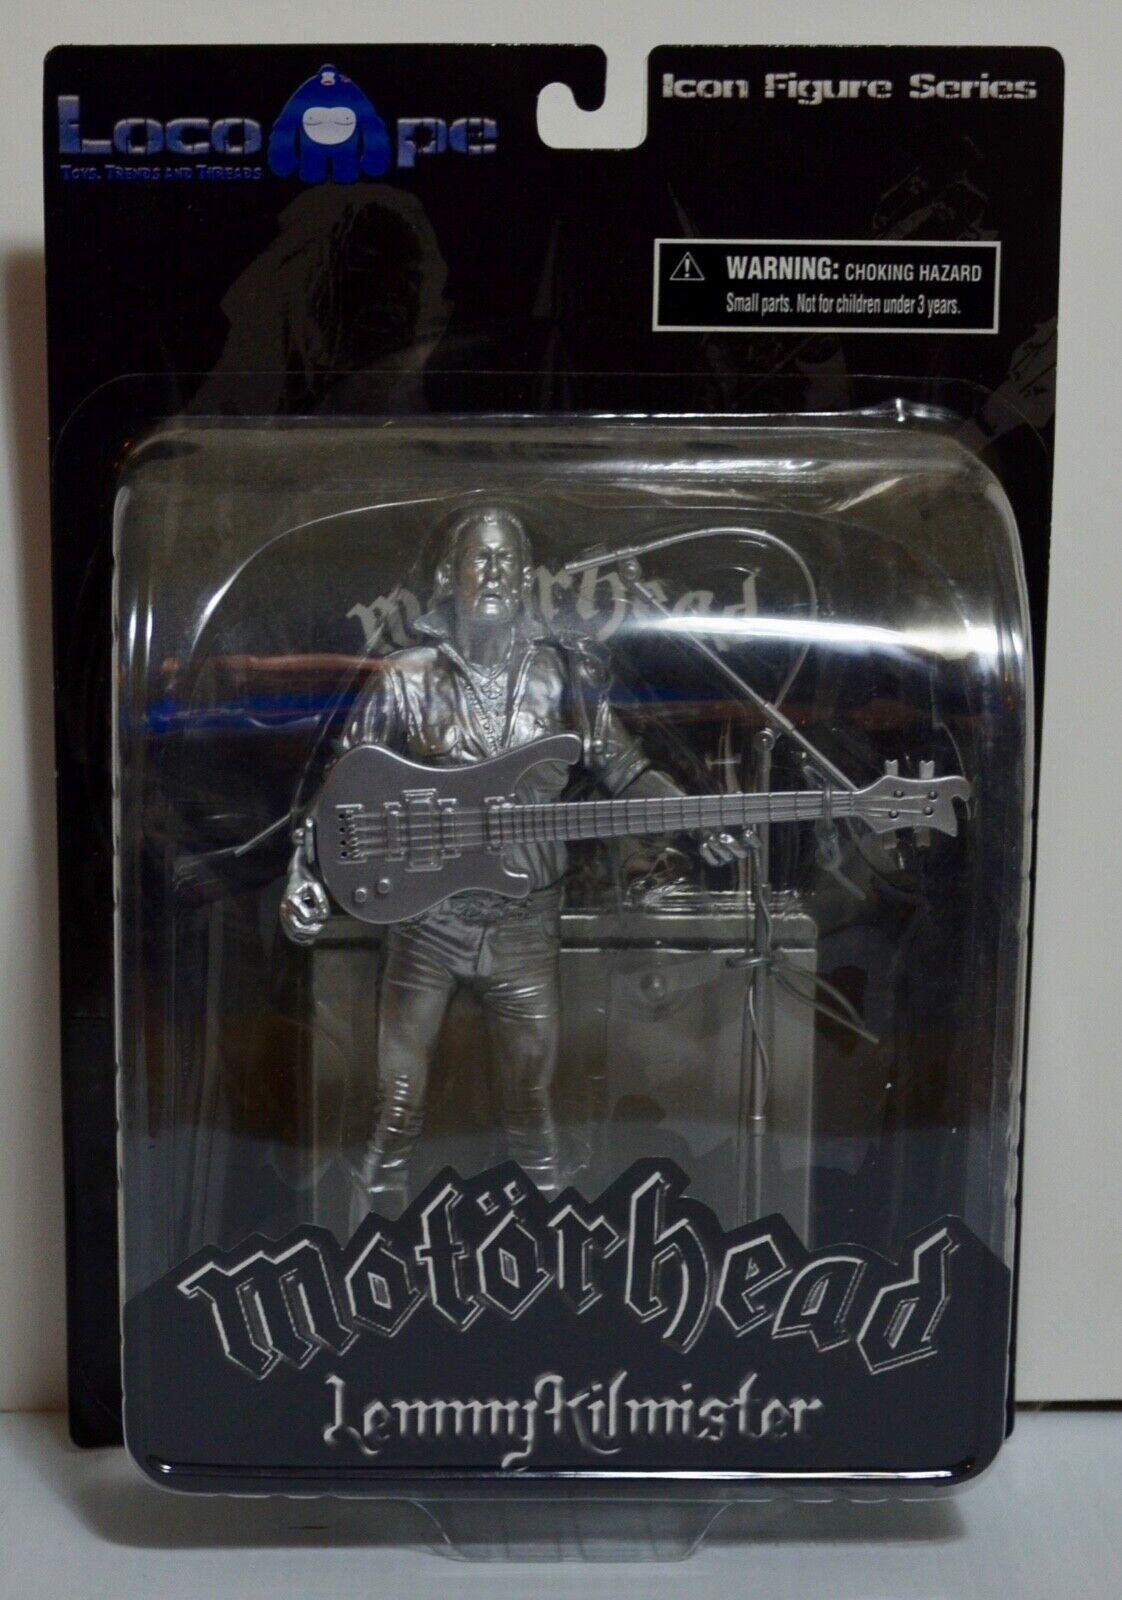 Motorhead Lemmy Kilmister Locoape Plata Variante Figura de edición limitada de 300